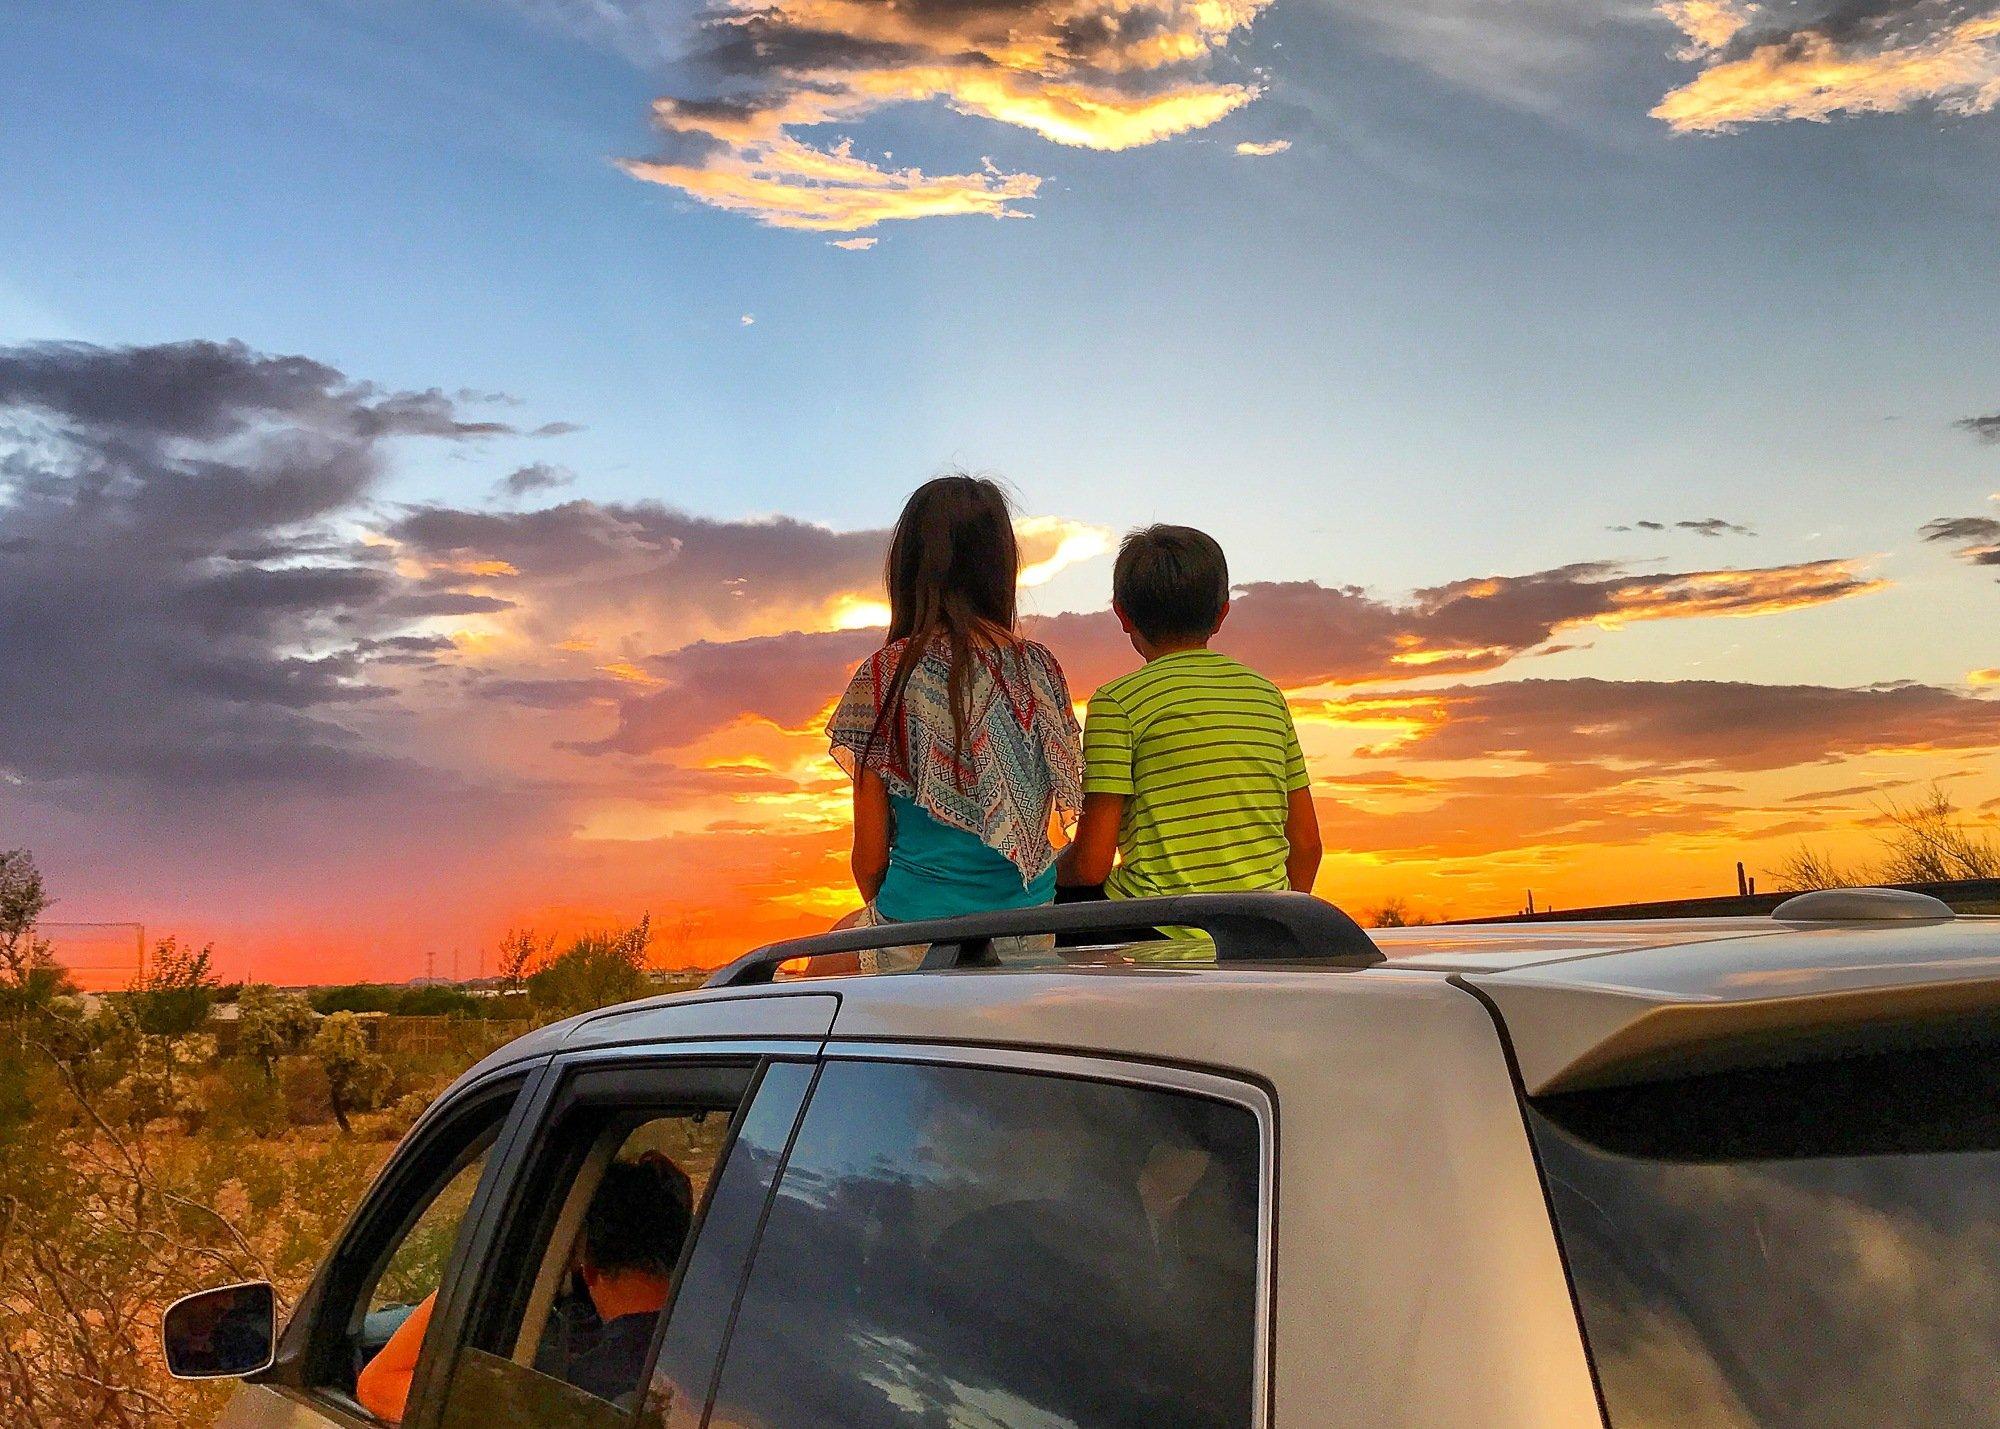 Arizona sunset with kids